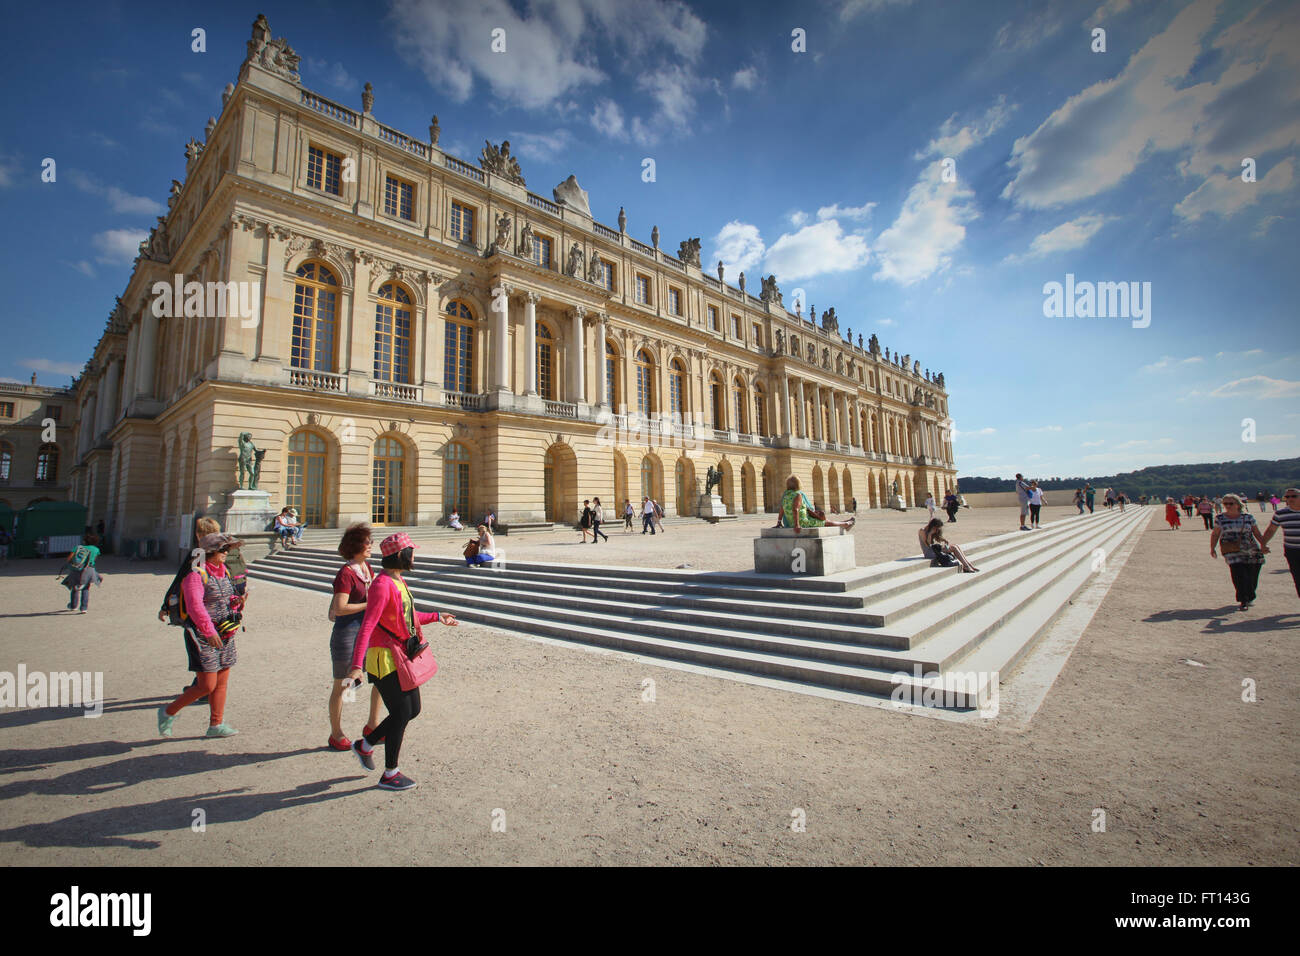 Palazzo di Versailles, Versailles vicino a Parigi, Francia Immagini Stock